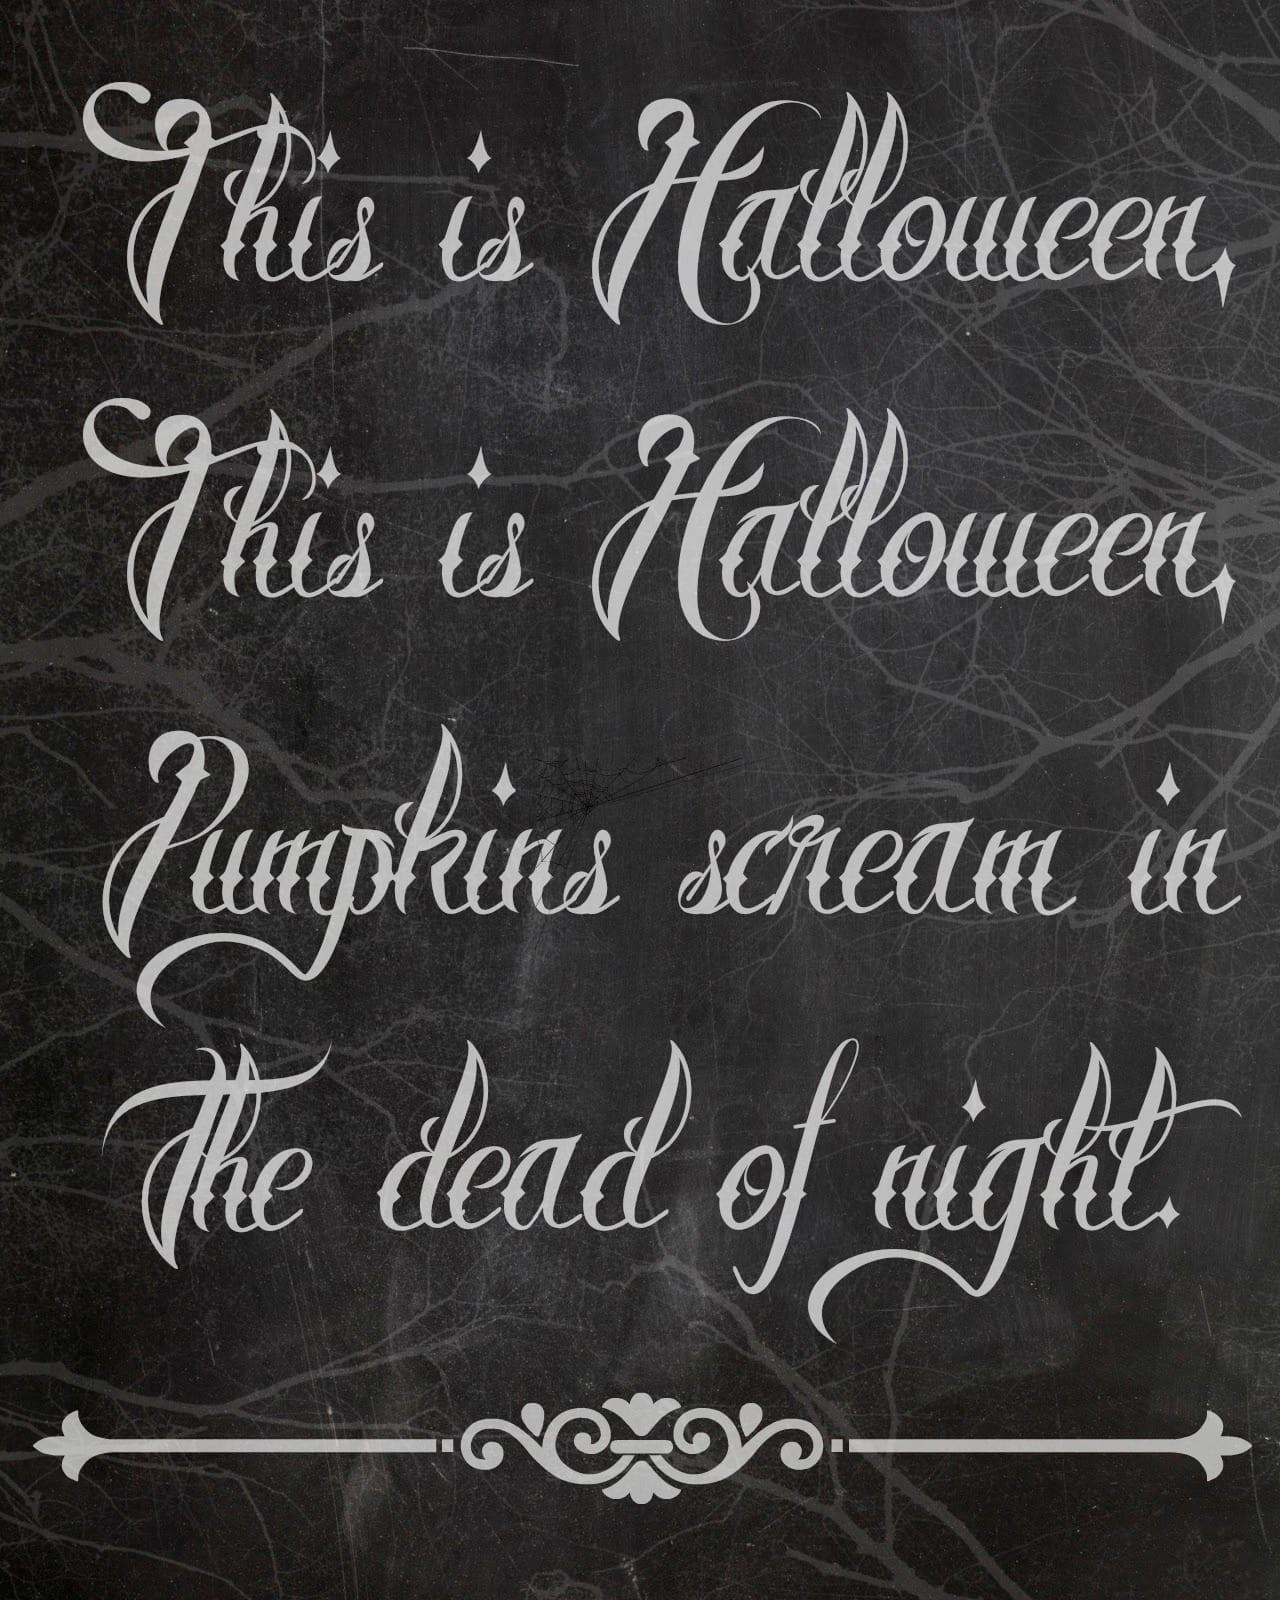 Happy Halloween! - Haunted Houses Chicago